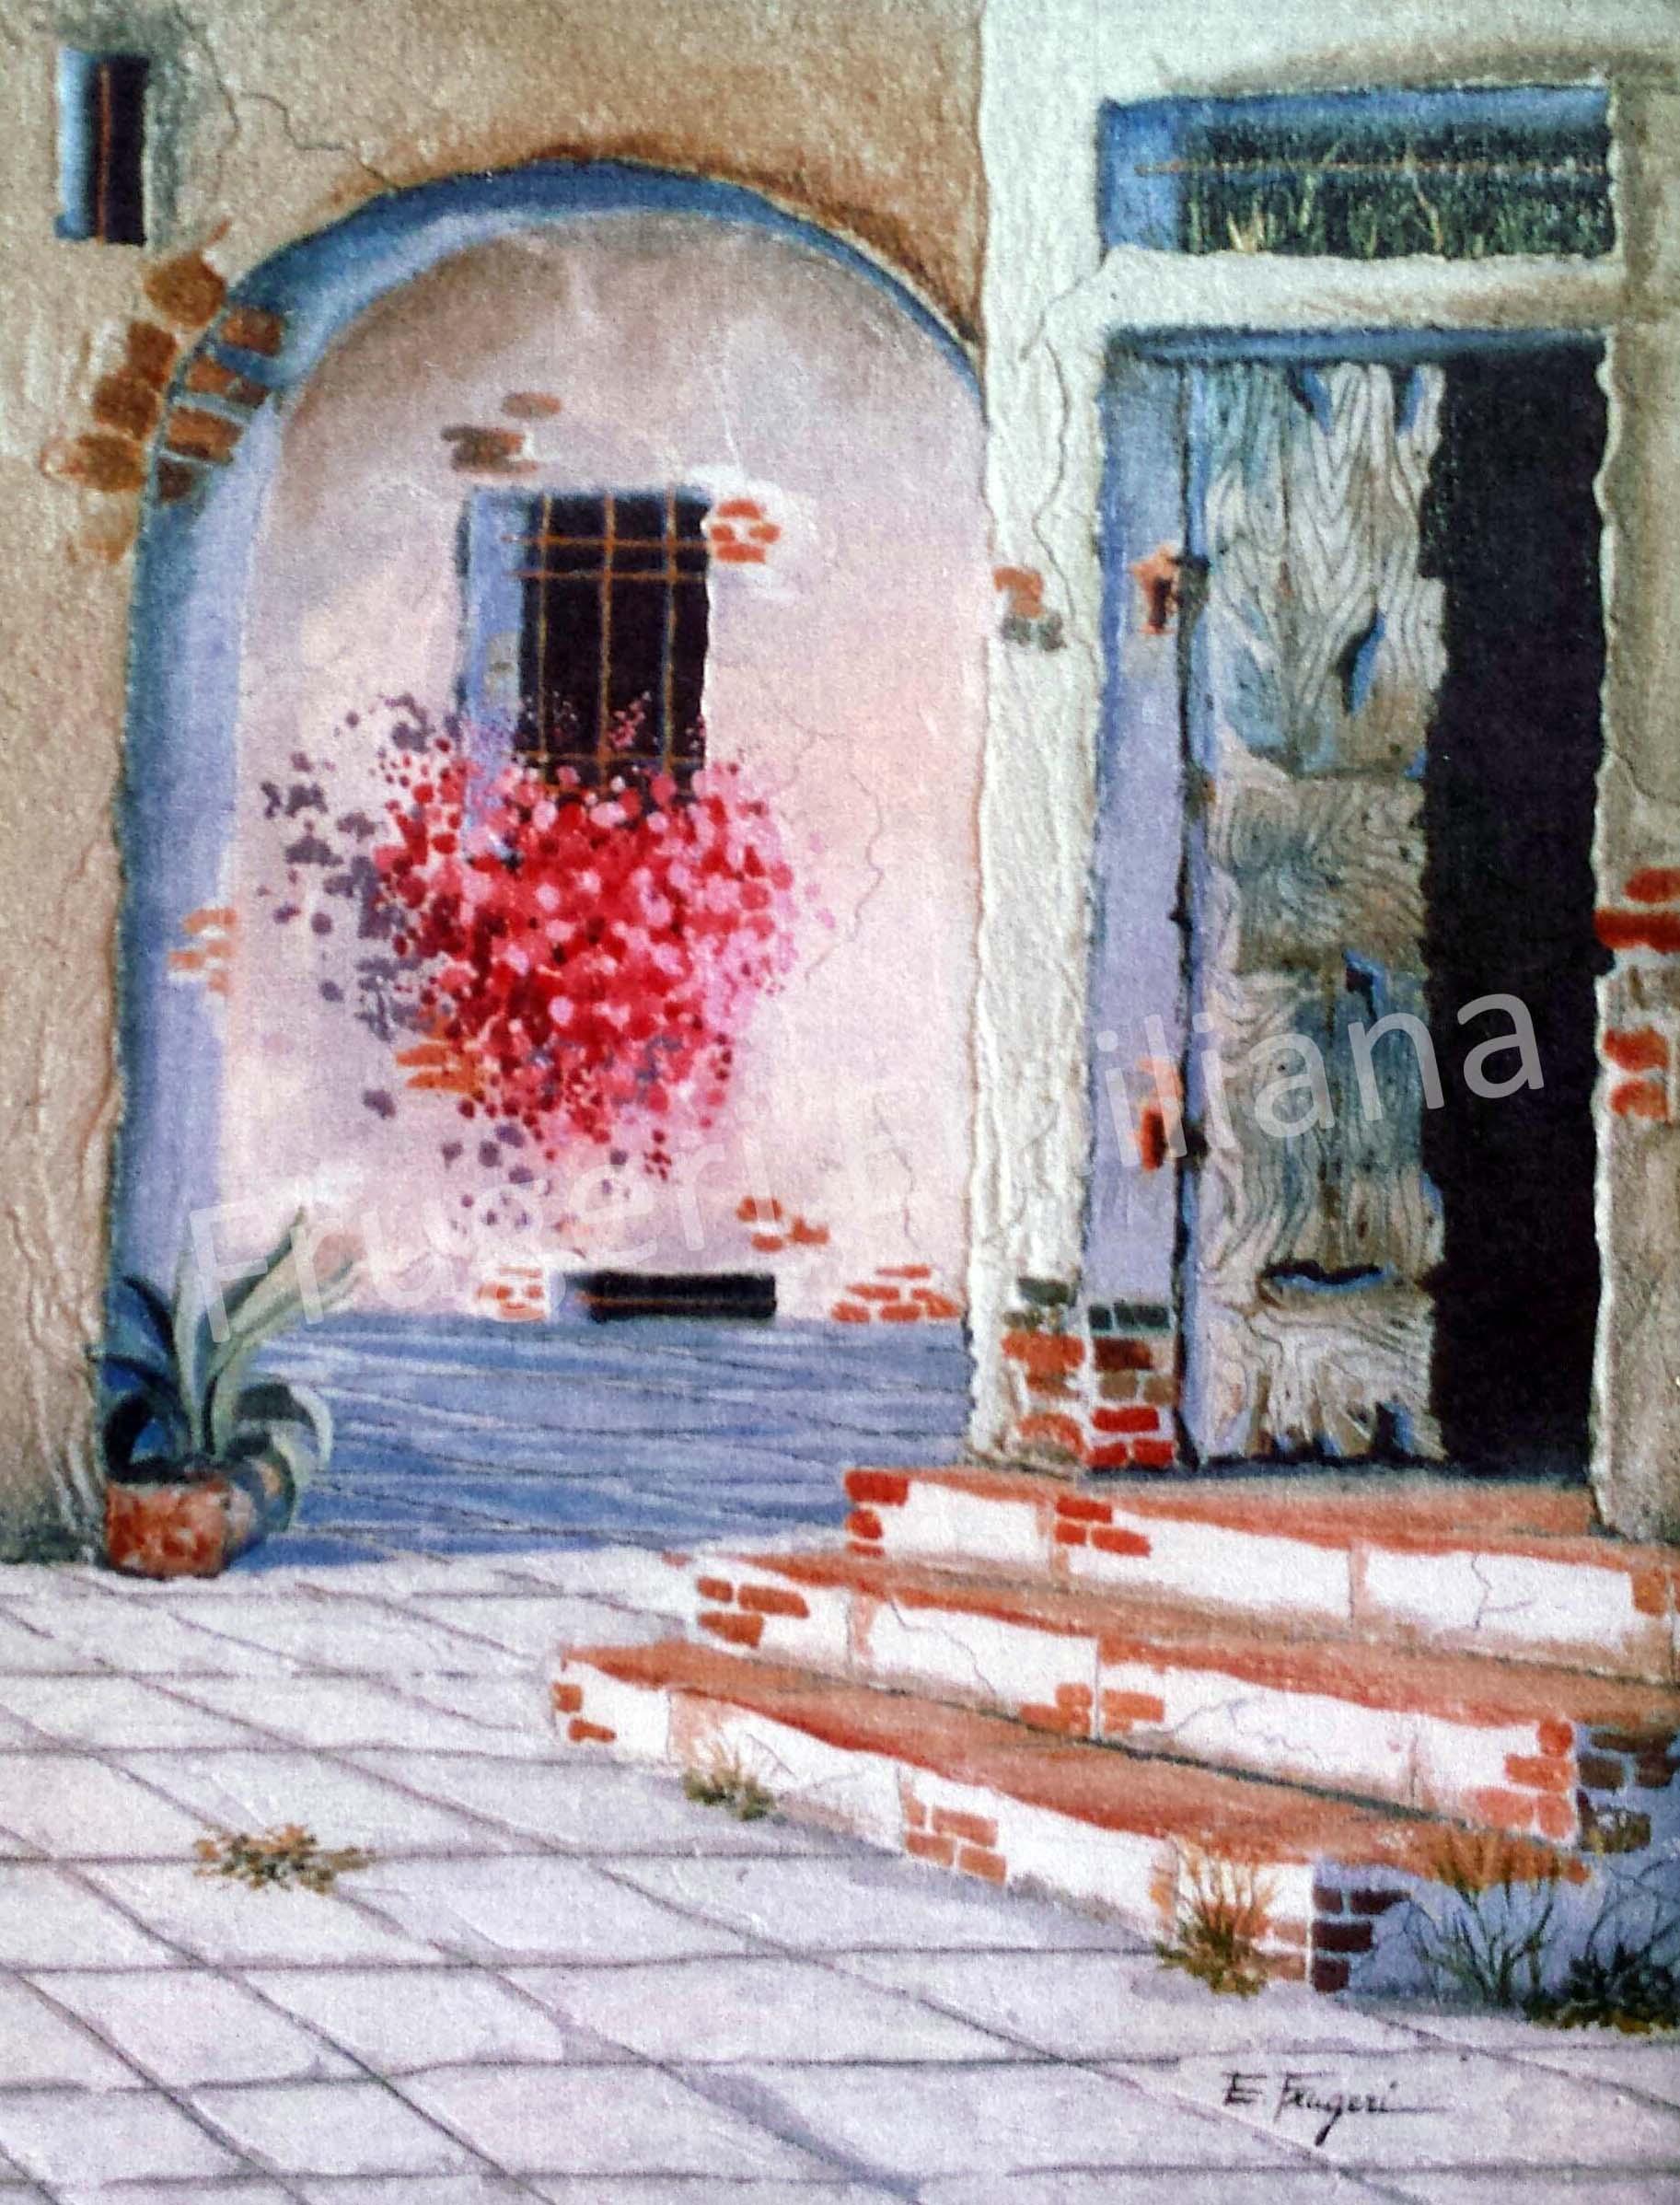 Frugeri Emiliana 216-Verso Casa-40x50-Olio su Tela